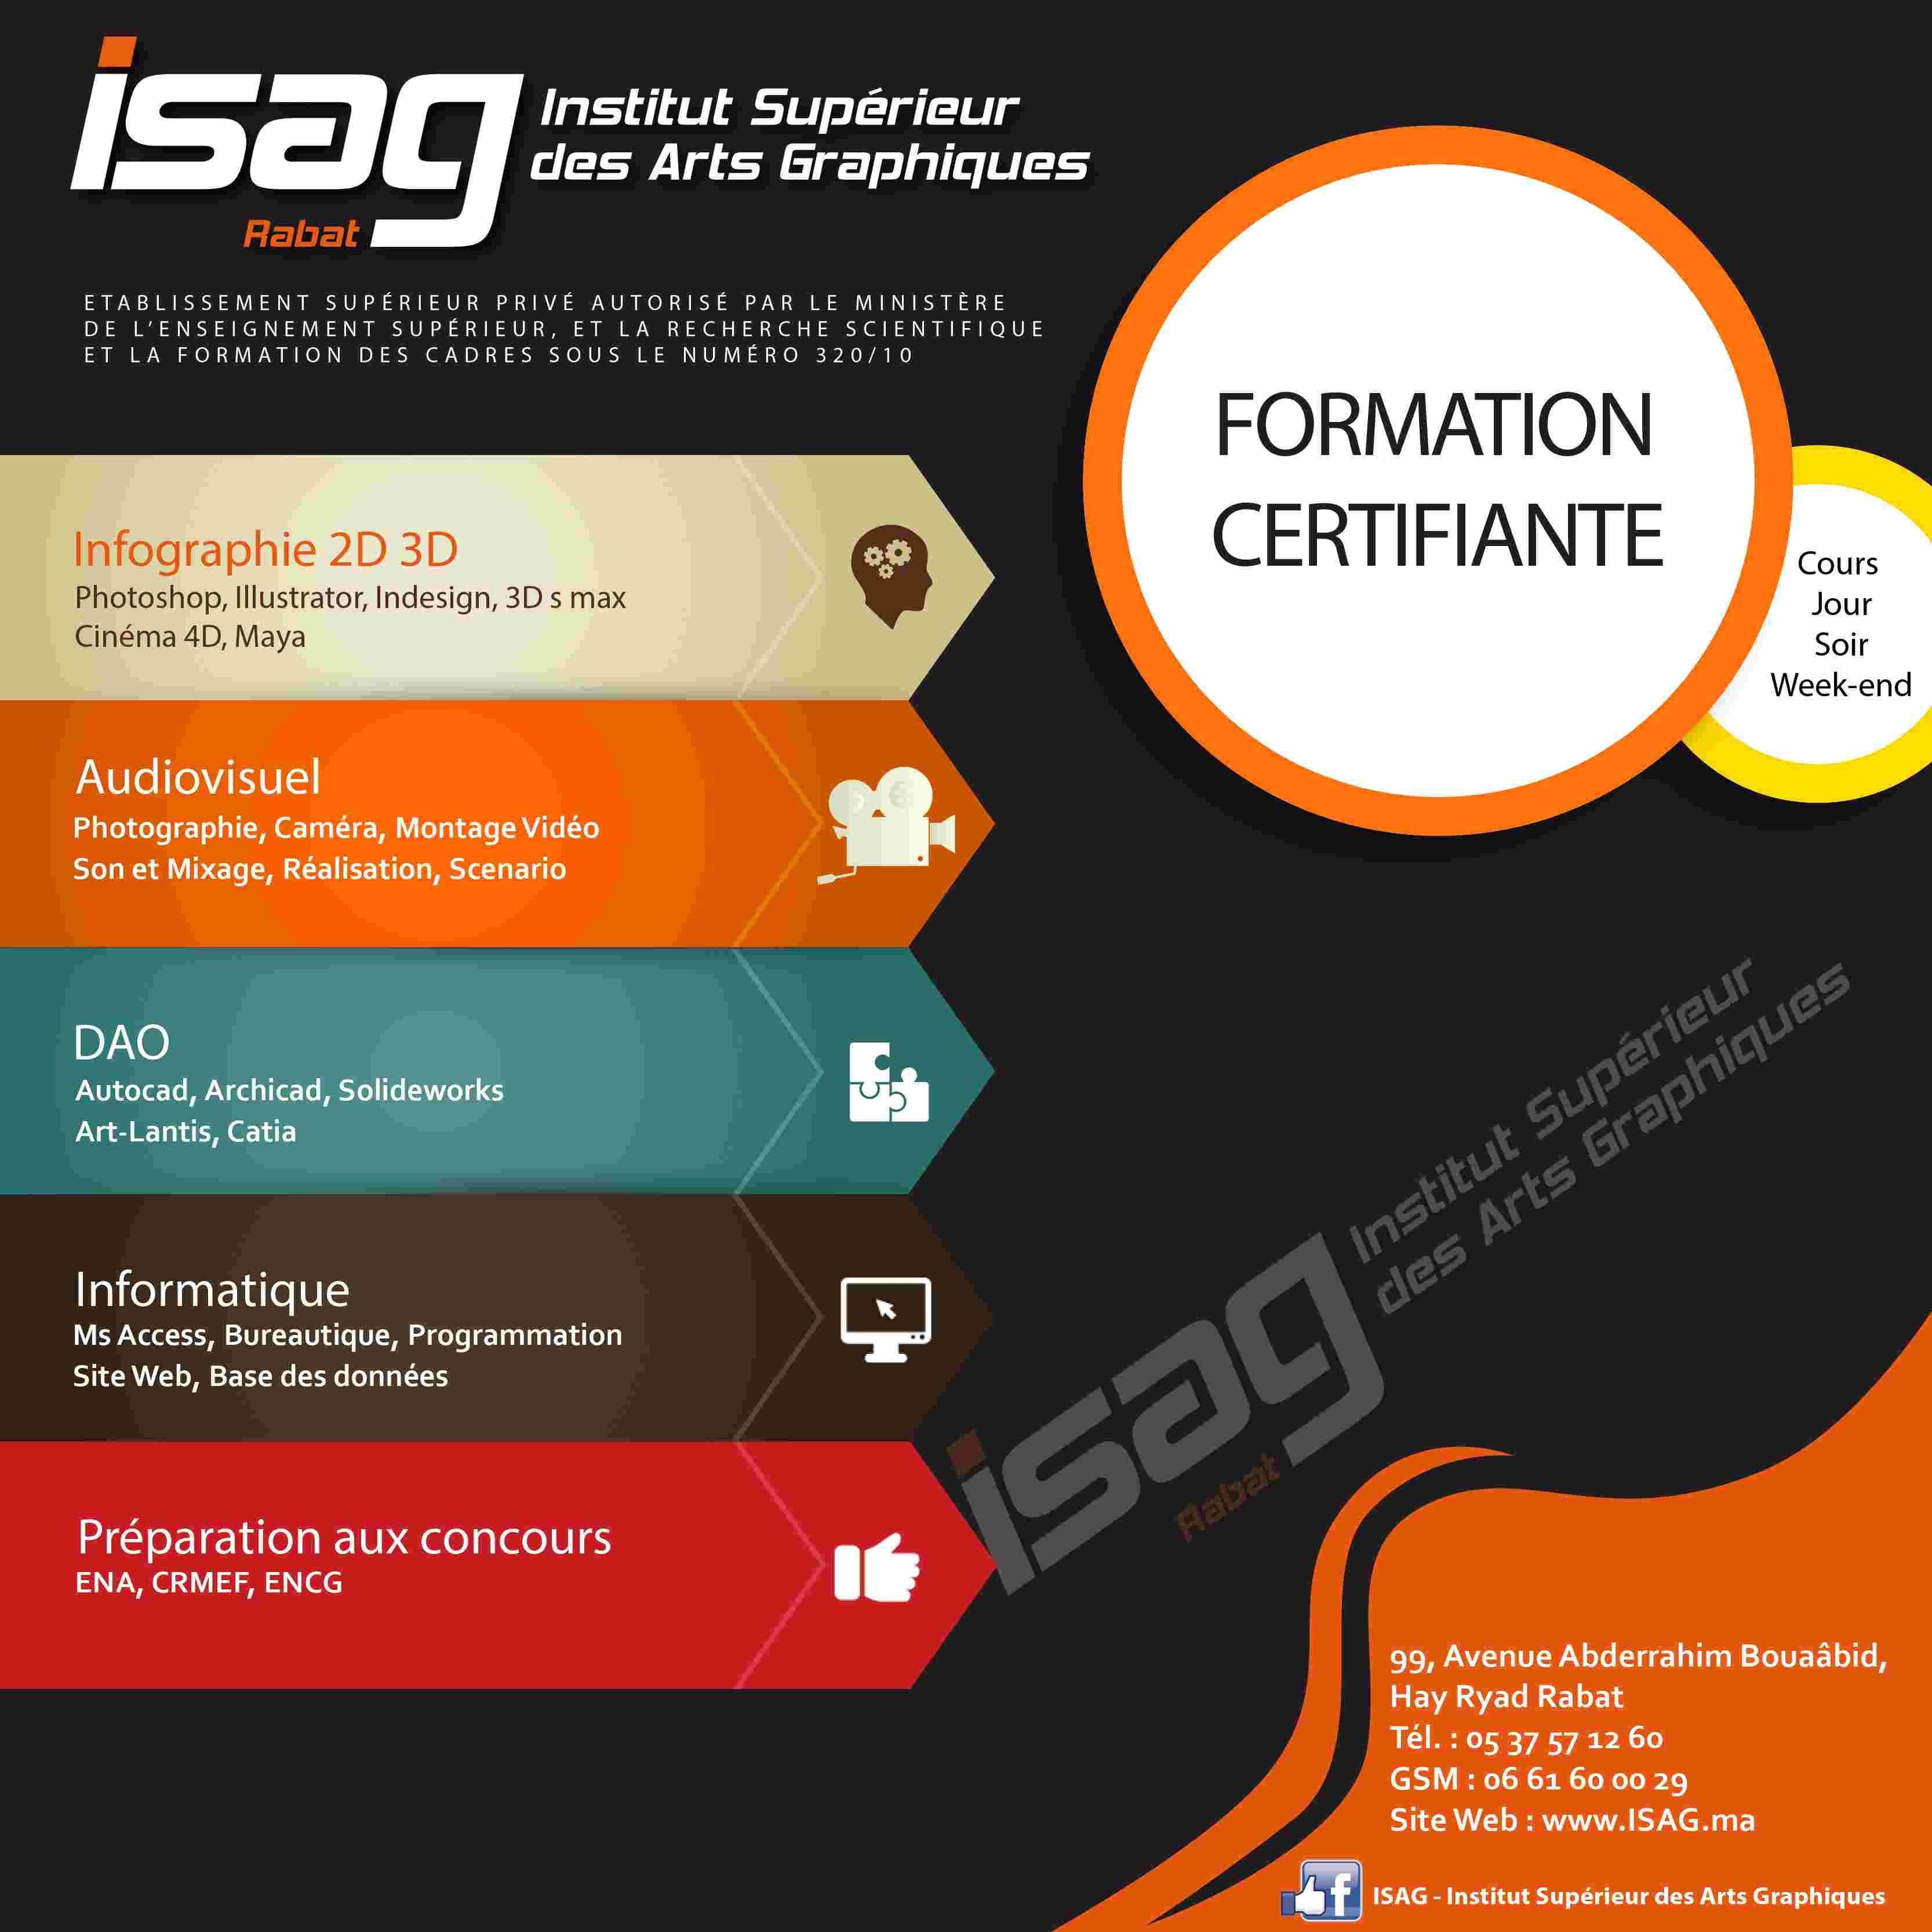 ISAG Formation Certifiante